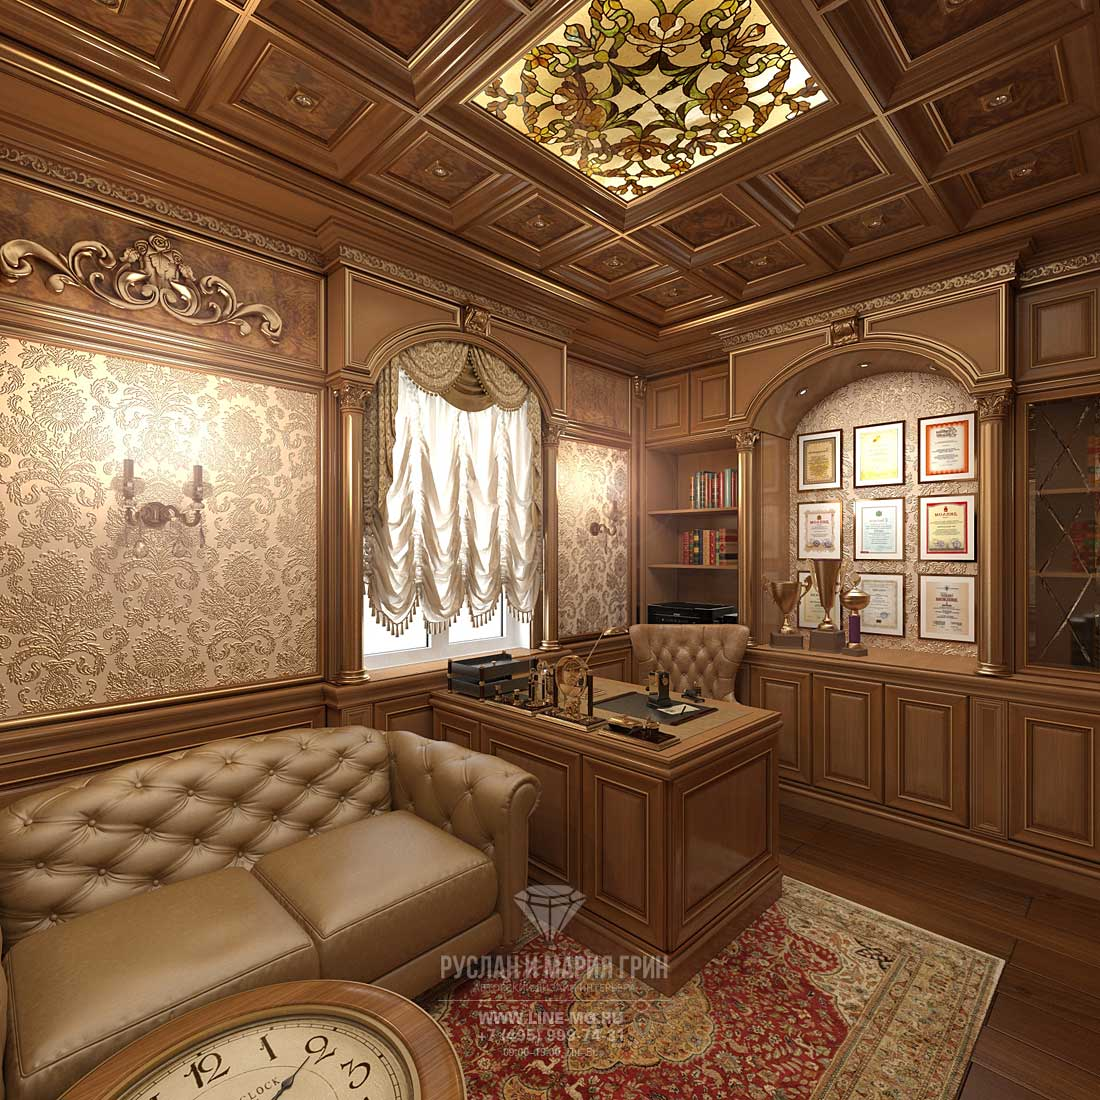 Interior design project and renovation. Classic palatial ...